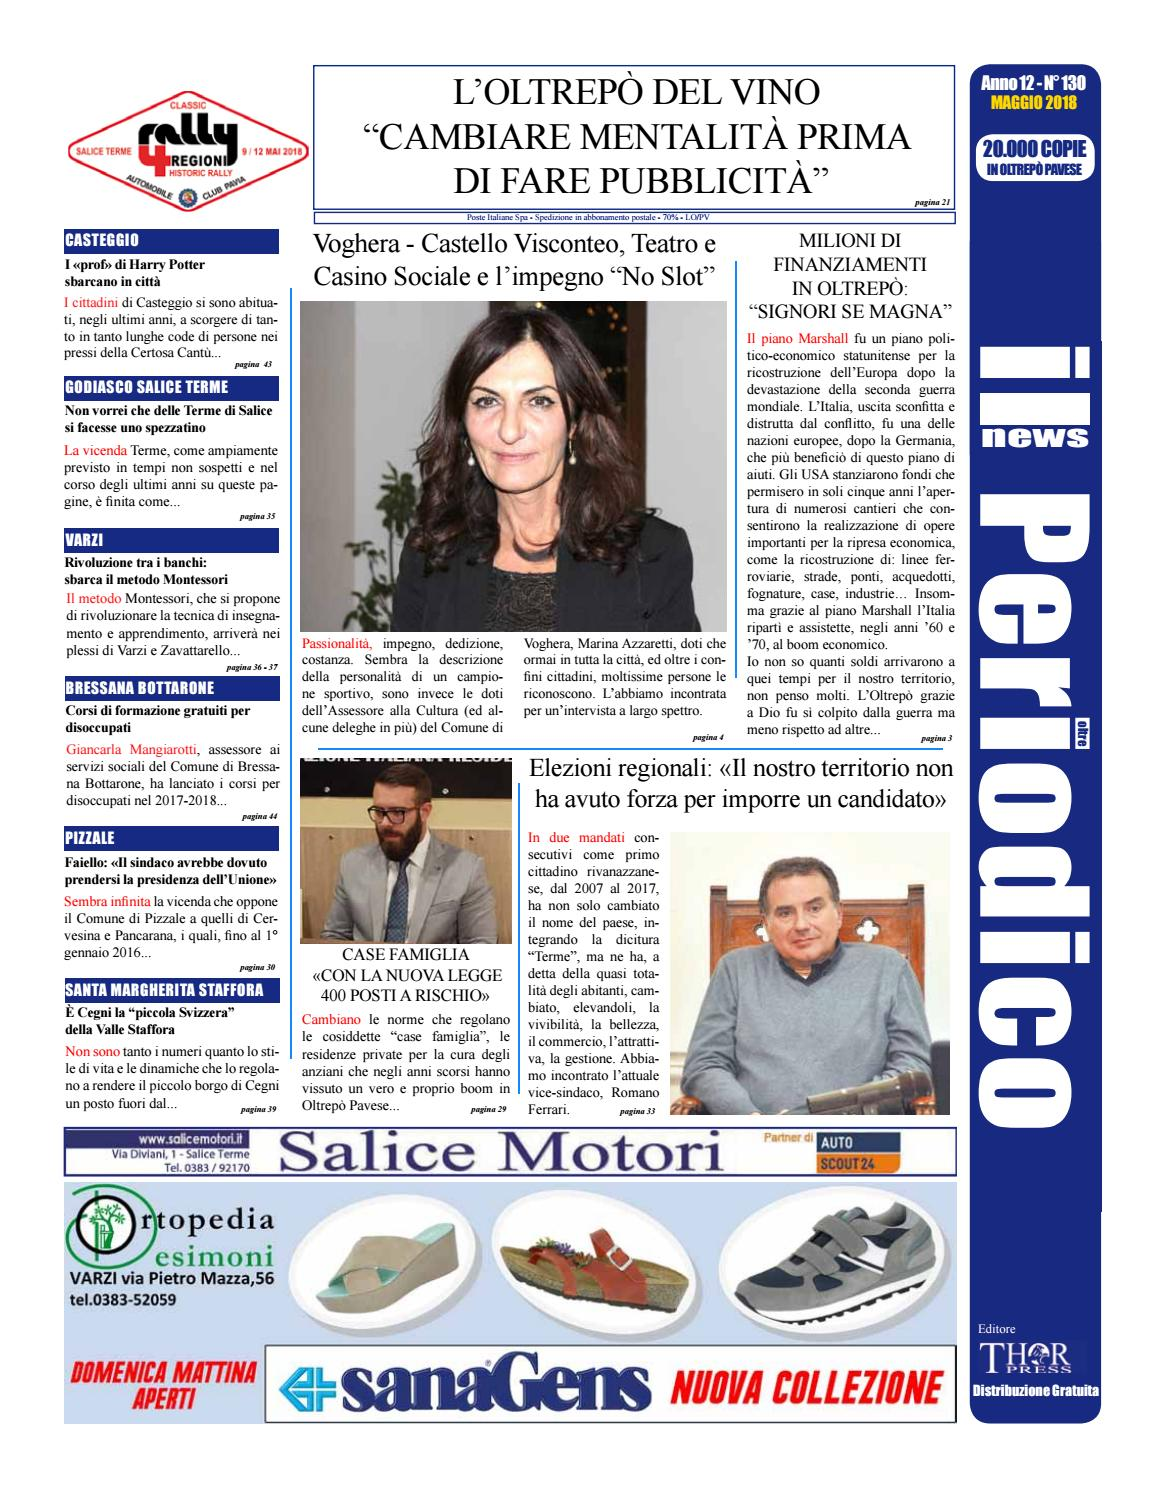 Il Periodico News - MAGGIO 2018 N°130 by IlPeriodicoNews - issuu 5590733ff1c